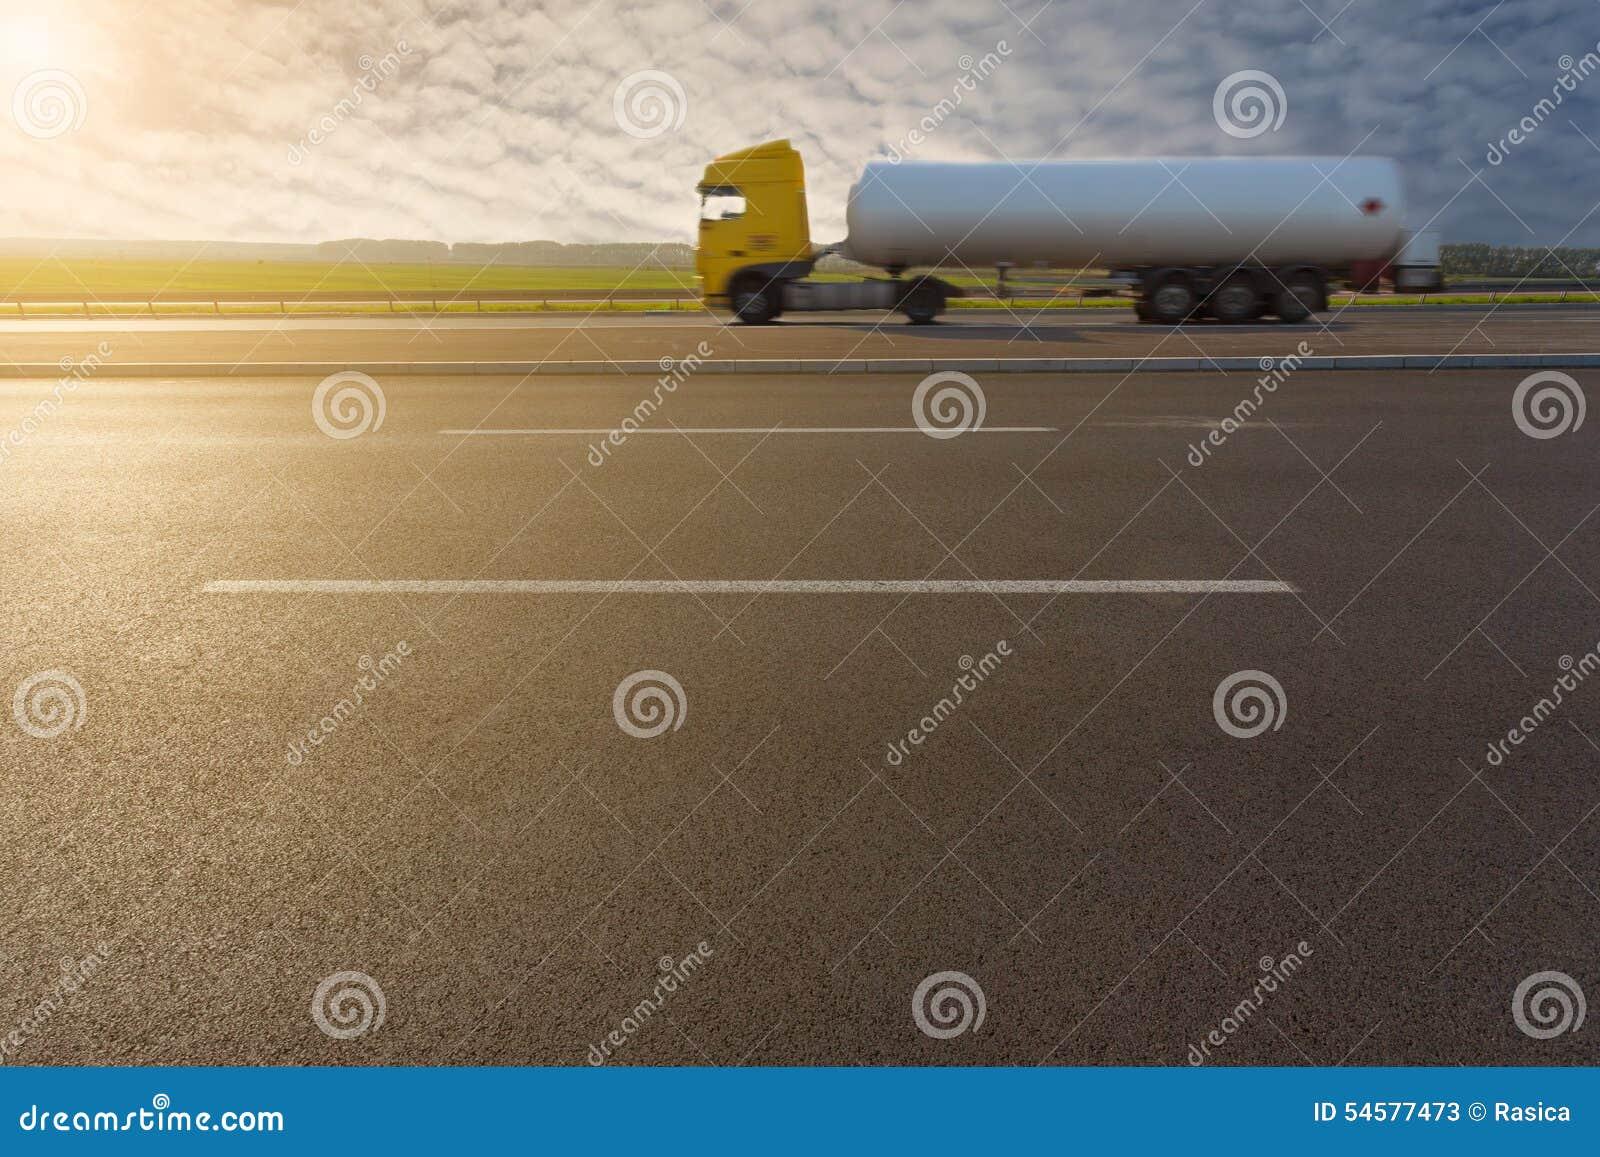 Side view on tank truck in motion blur on motorway